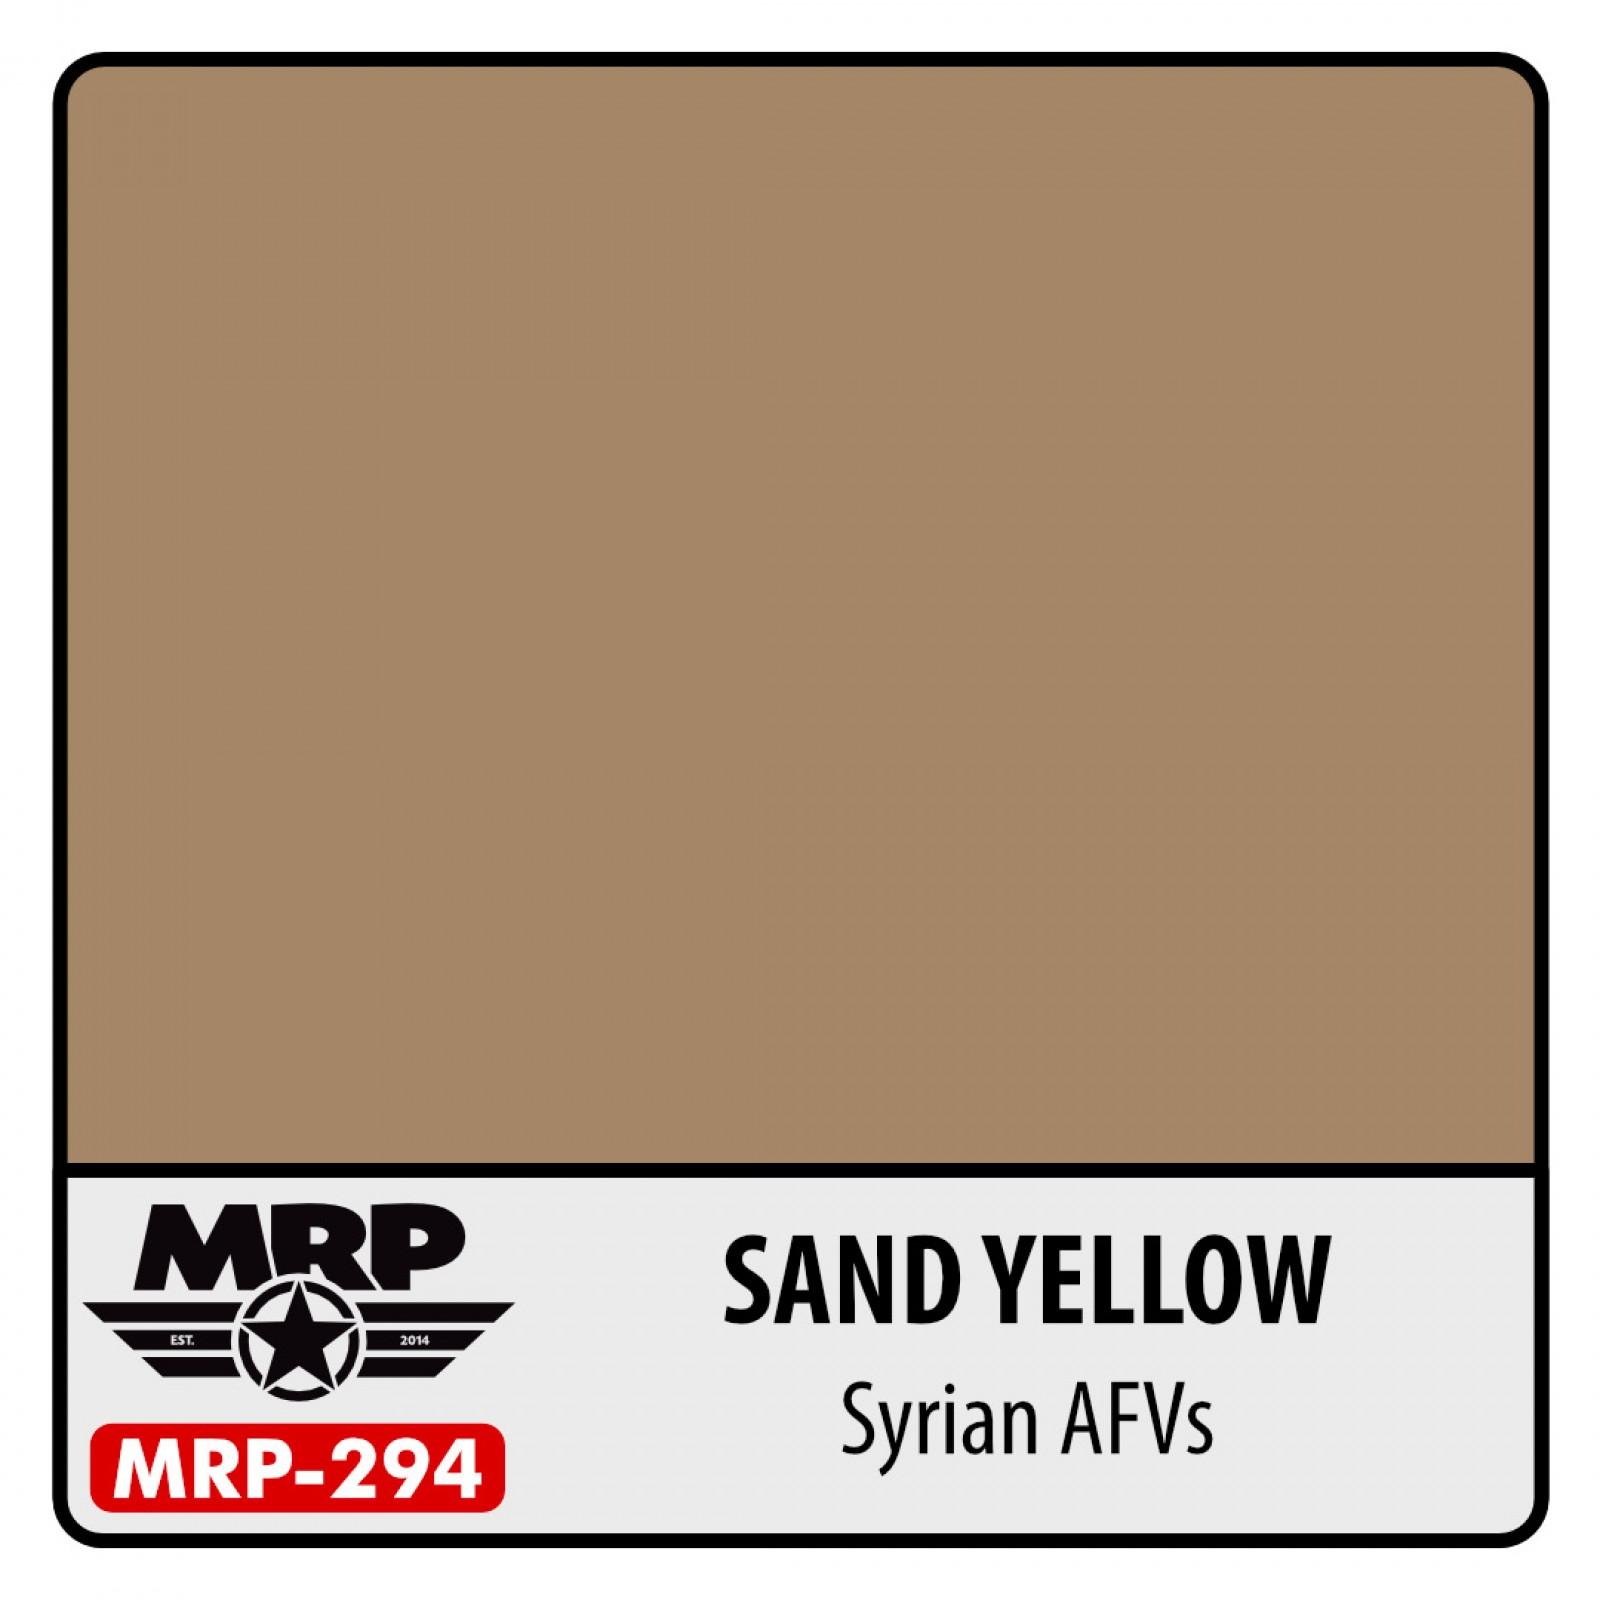 MRP-294  SAND YELLOW  Syrian AFVs